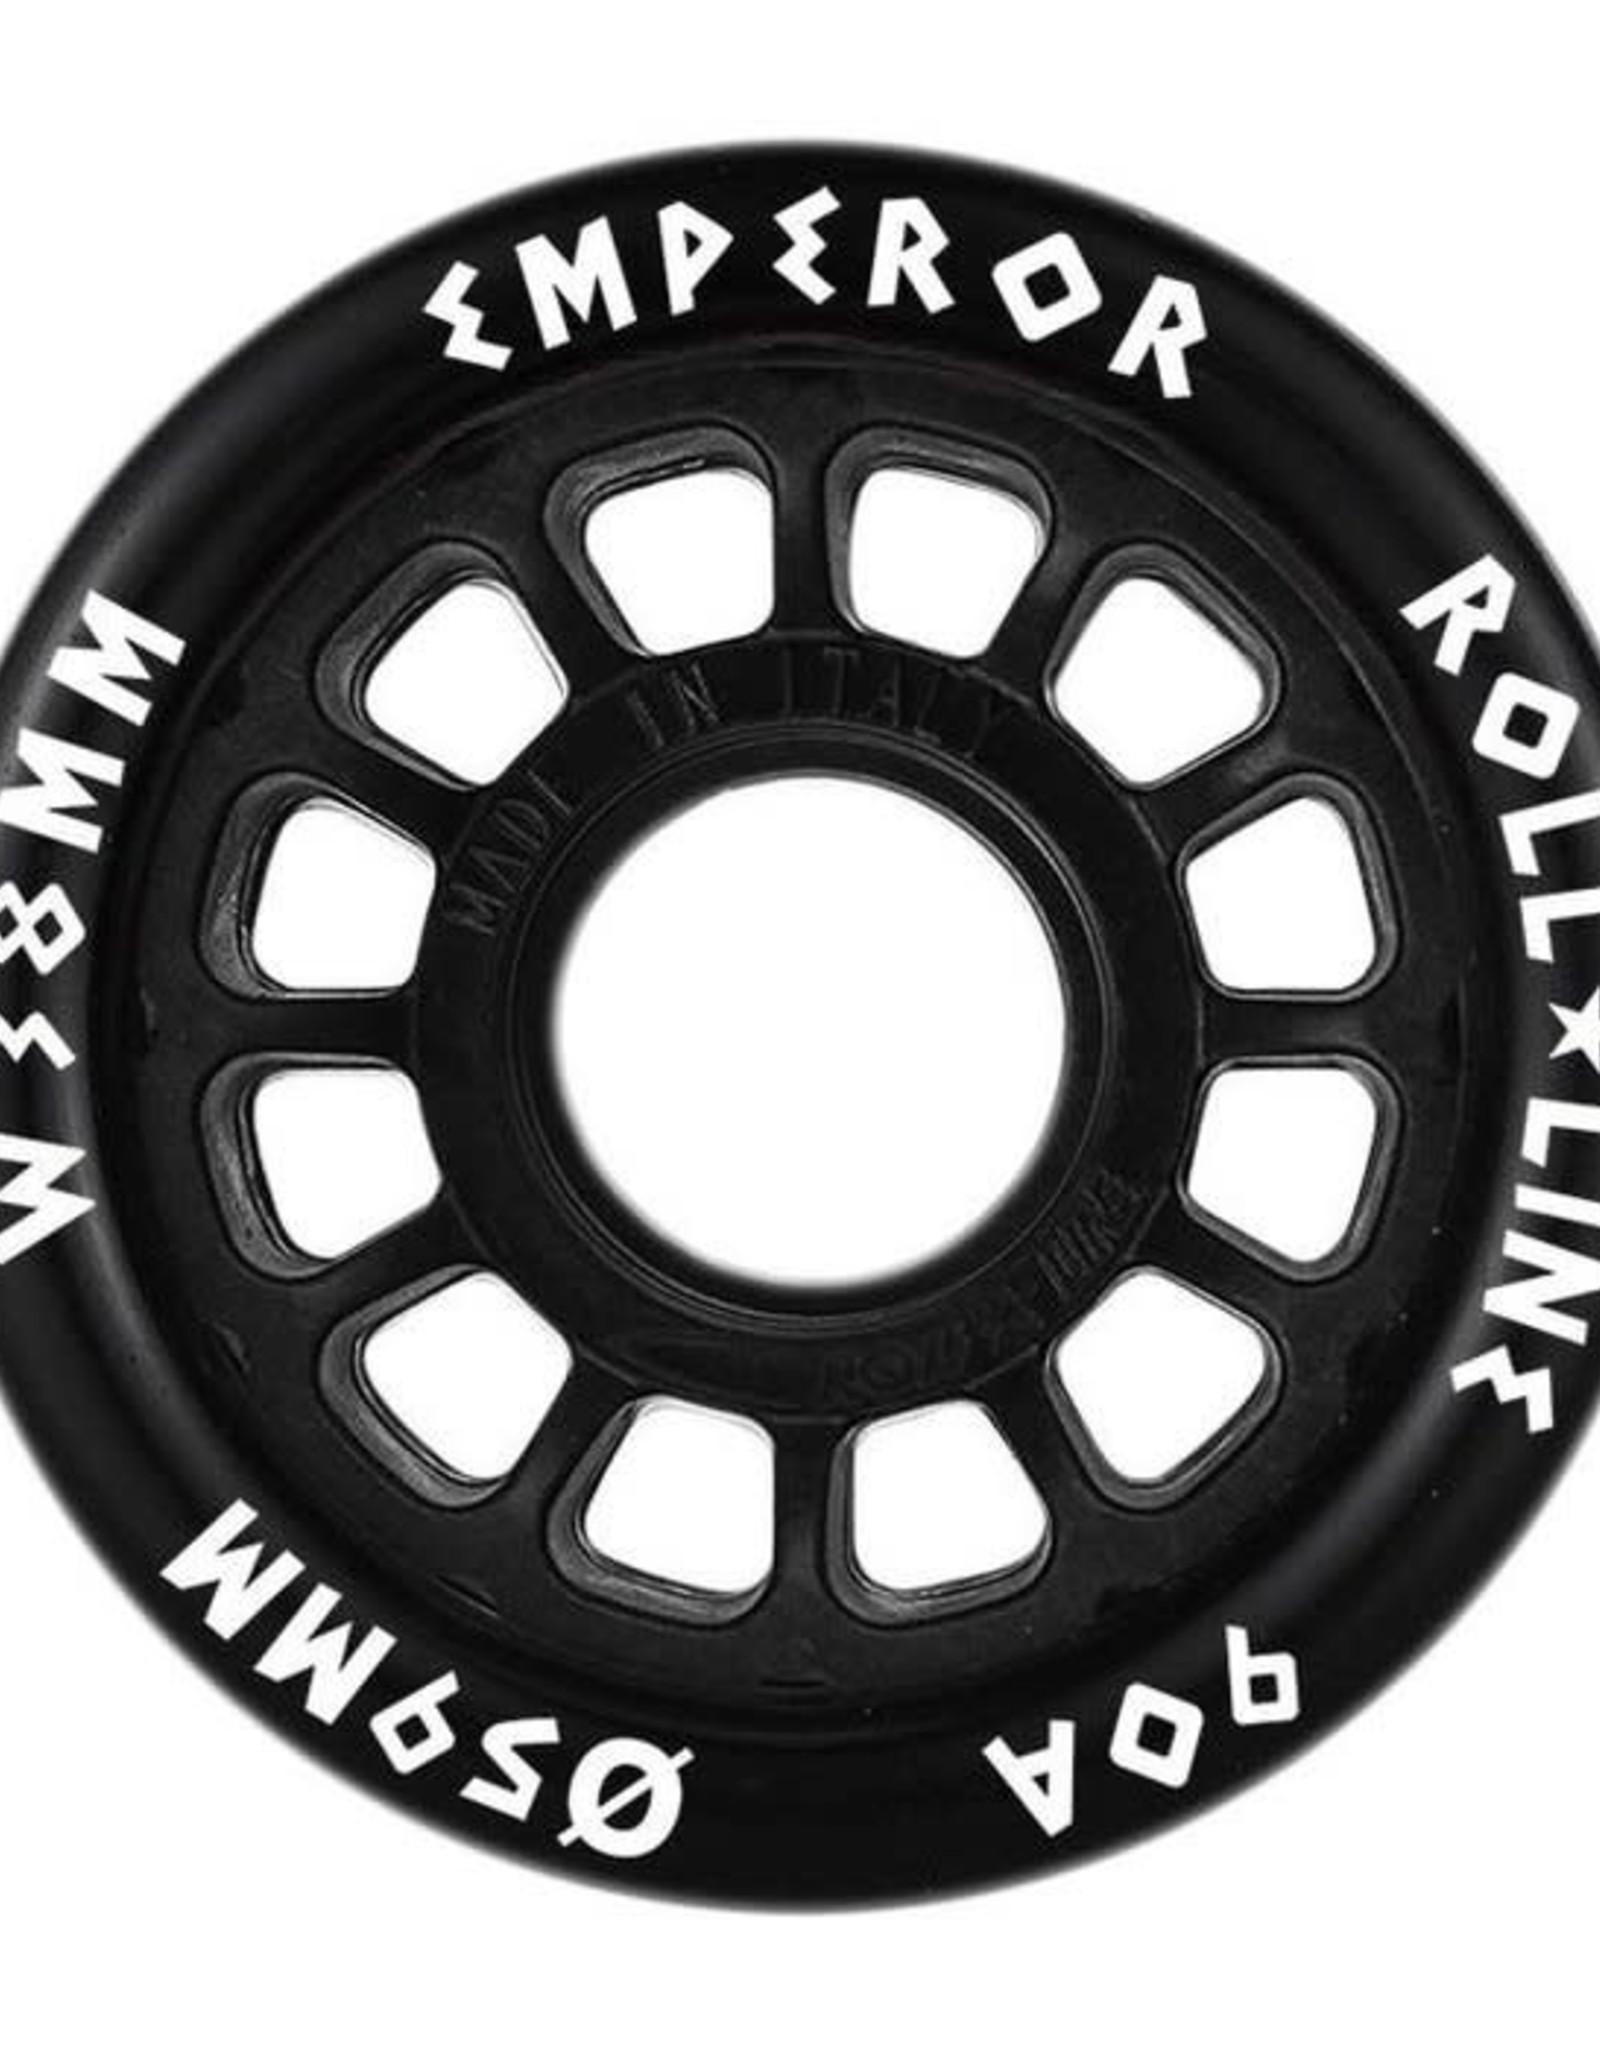 Roll Line Roll Line Emperor Wheels, 4 Pack